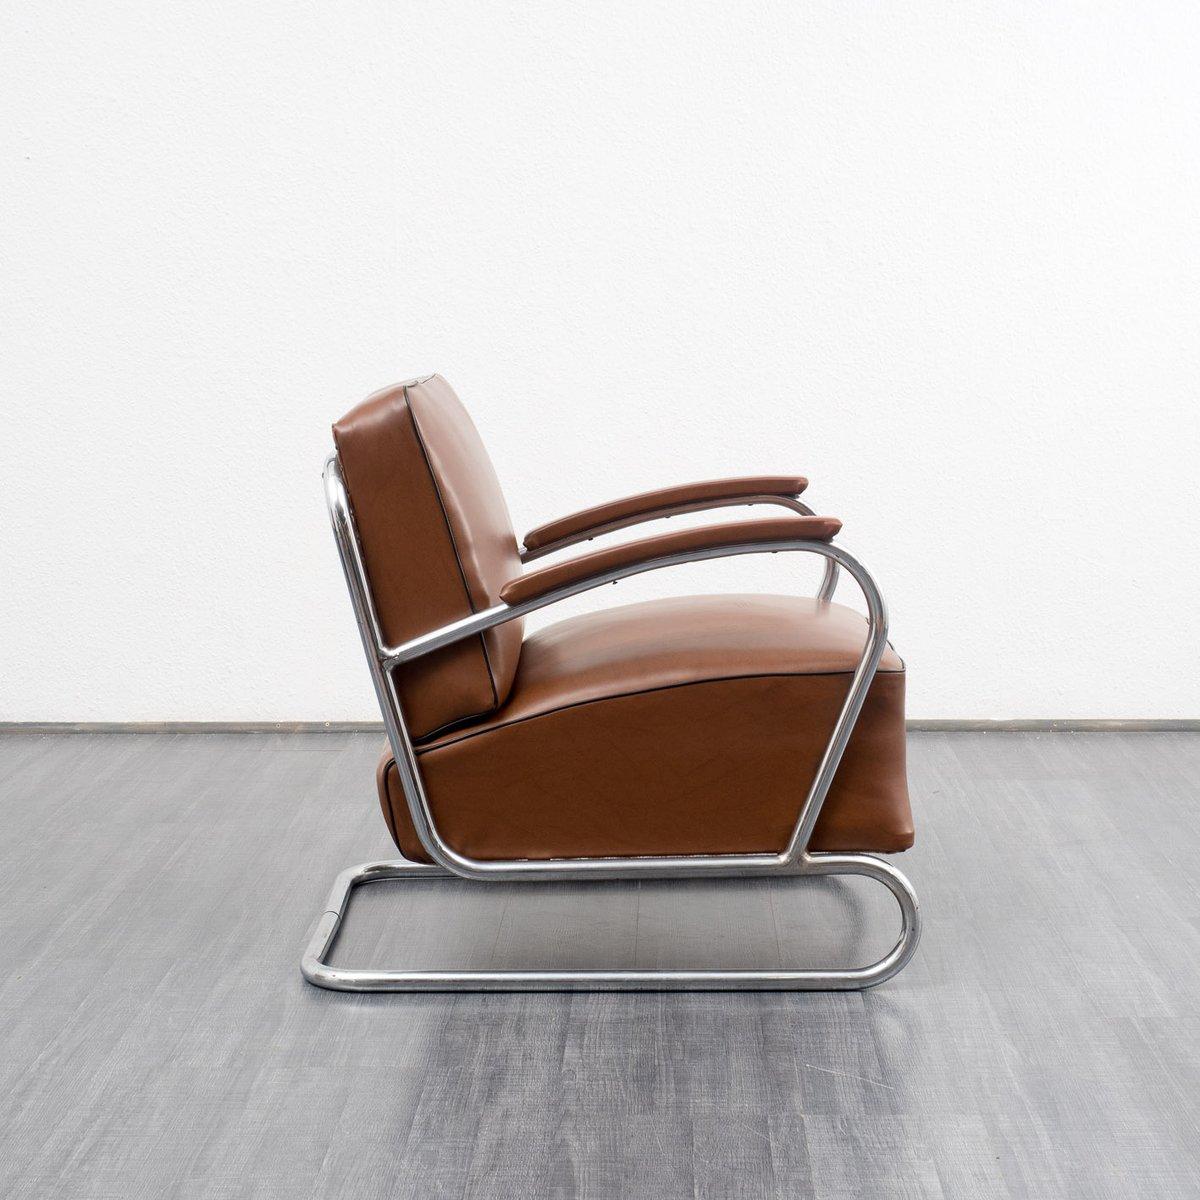 vintage armlehnstuhl im bauhaus stil bei pamono kaufen. Black Bedroom Furniture Sets. Home Design Ideas